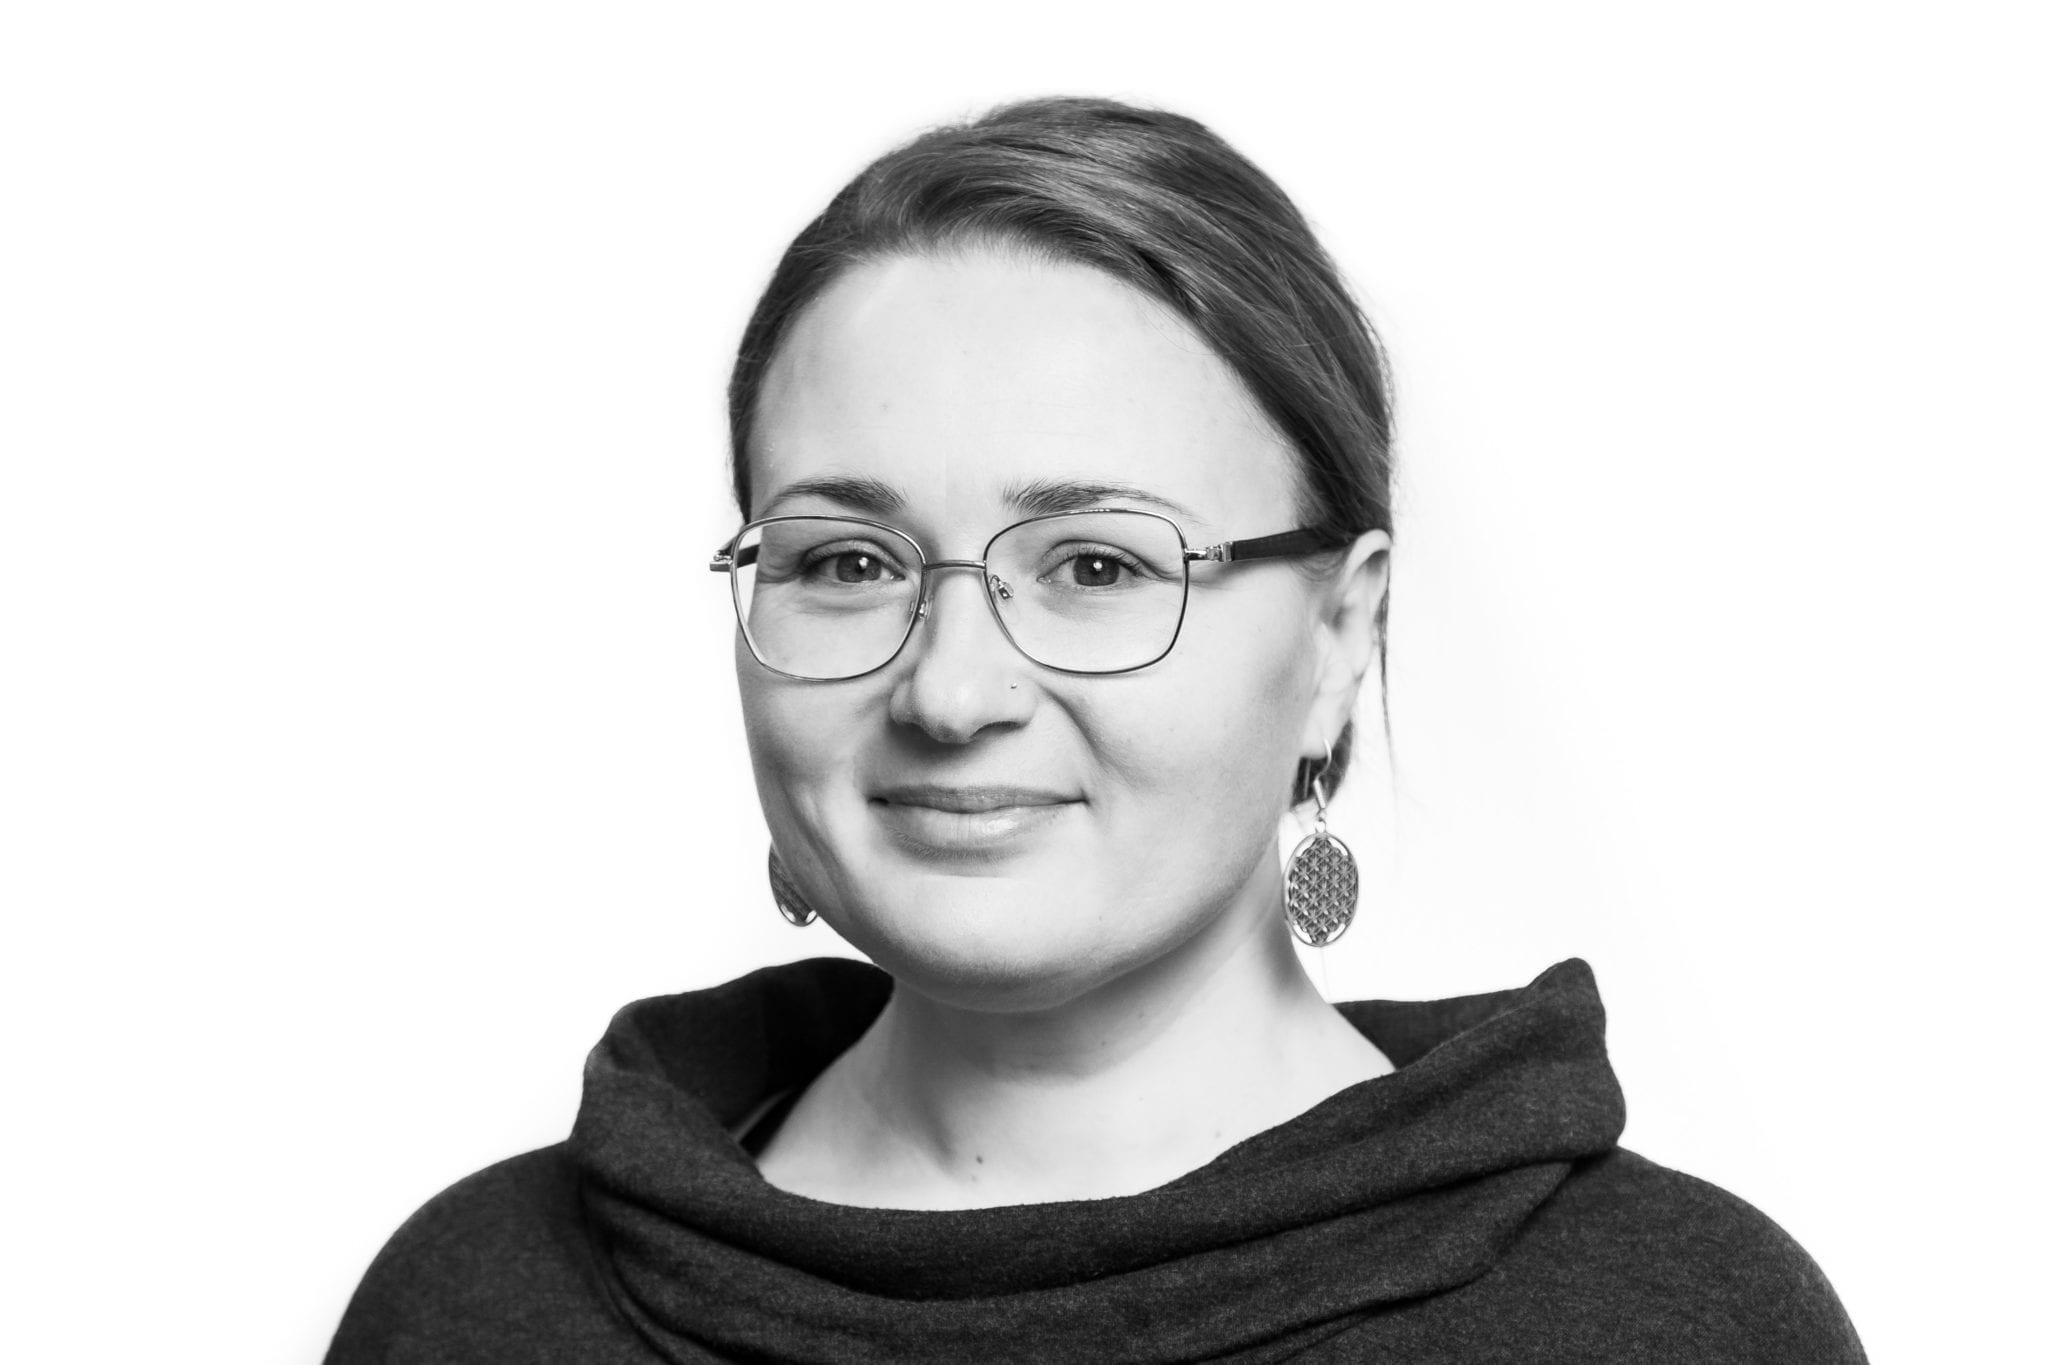 Aggie Kozlowska